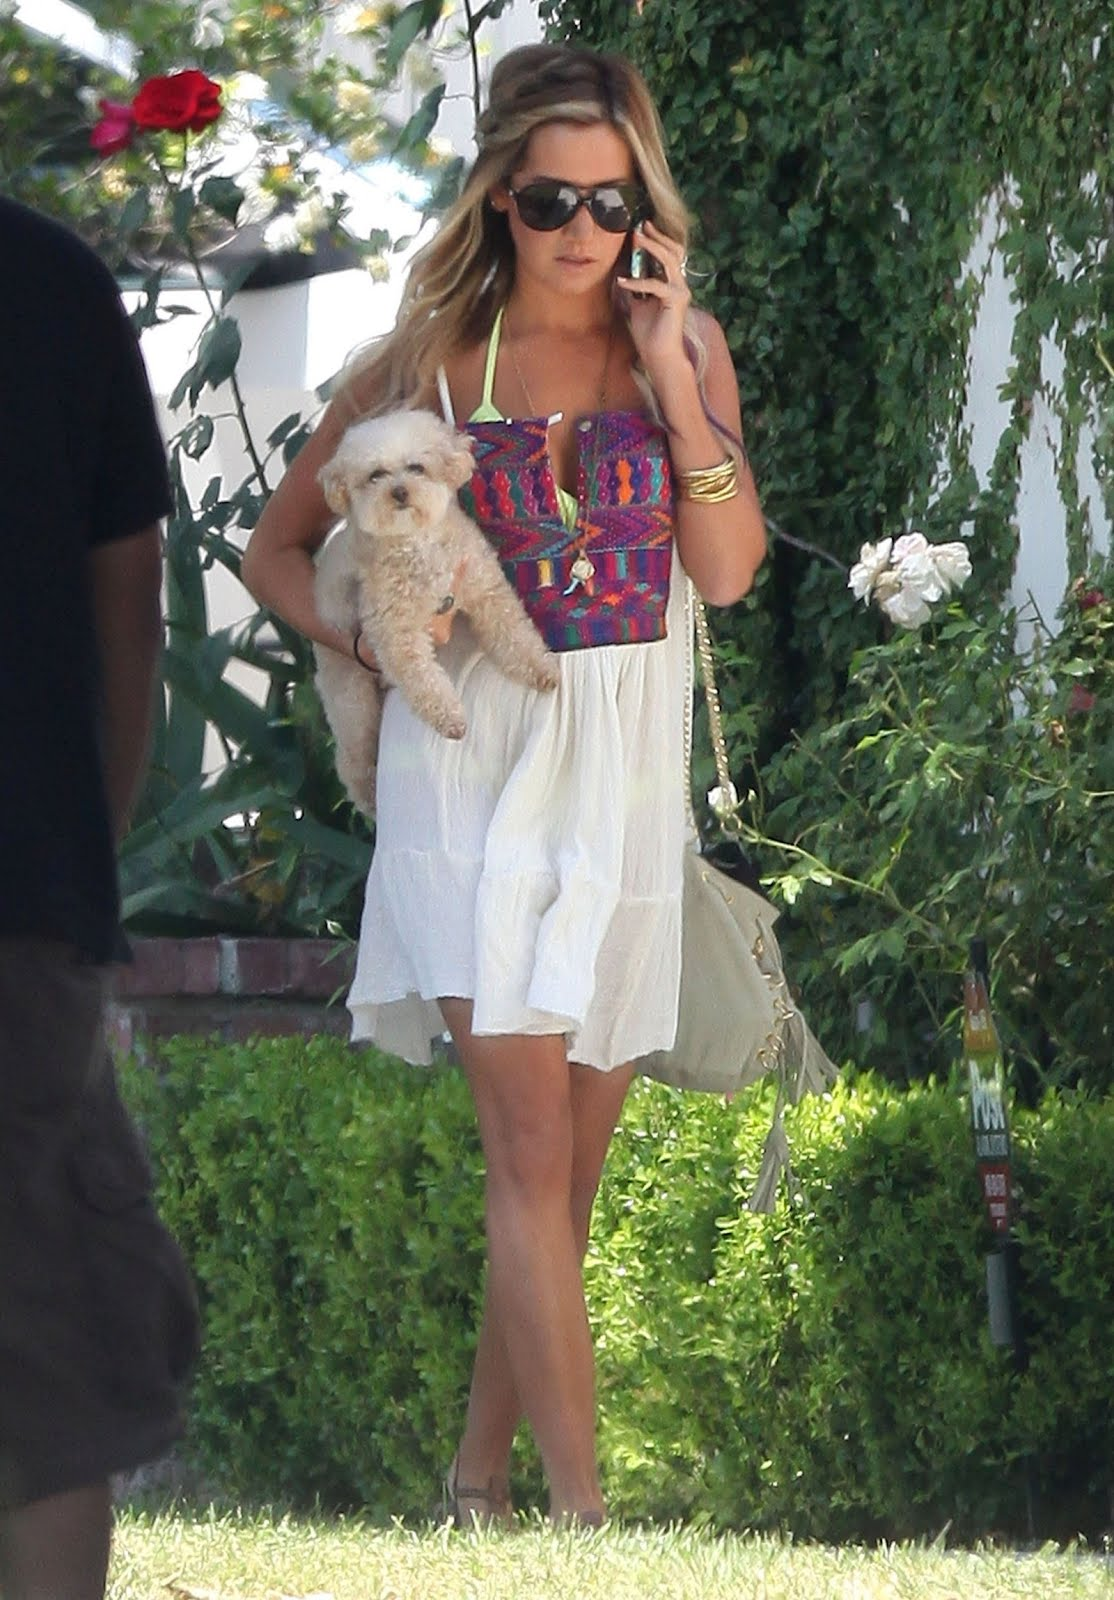 http://1.bp.blogspot.com/-TLKCK0PTbZE/UAWSU8UKkeI/AAAAAAAAAHY/TPLBmQkLPTc/s1600/Ashley-Tisdale-9.jpg